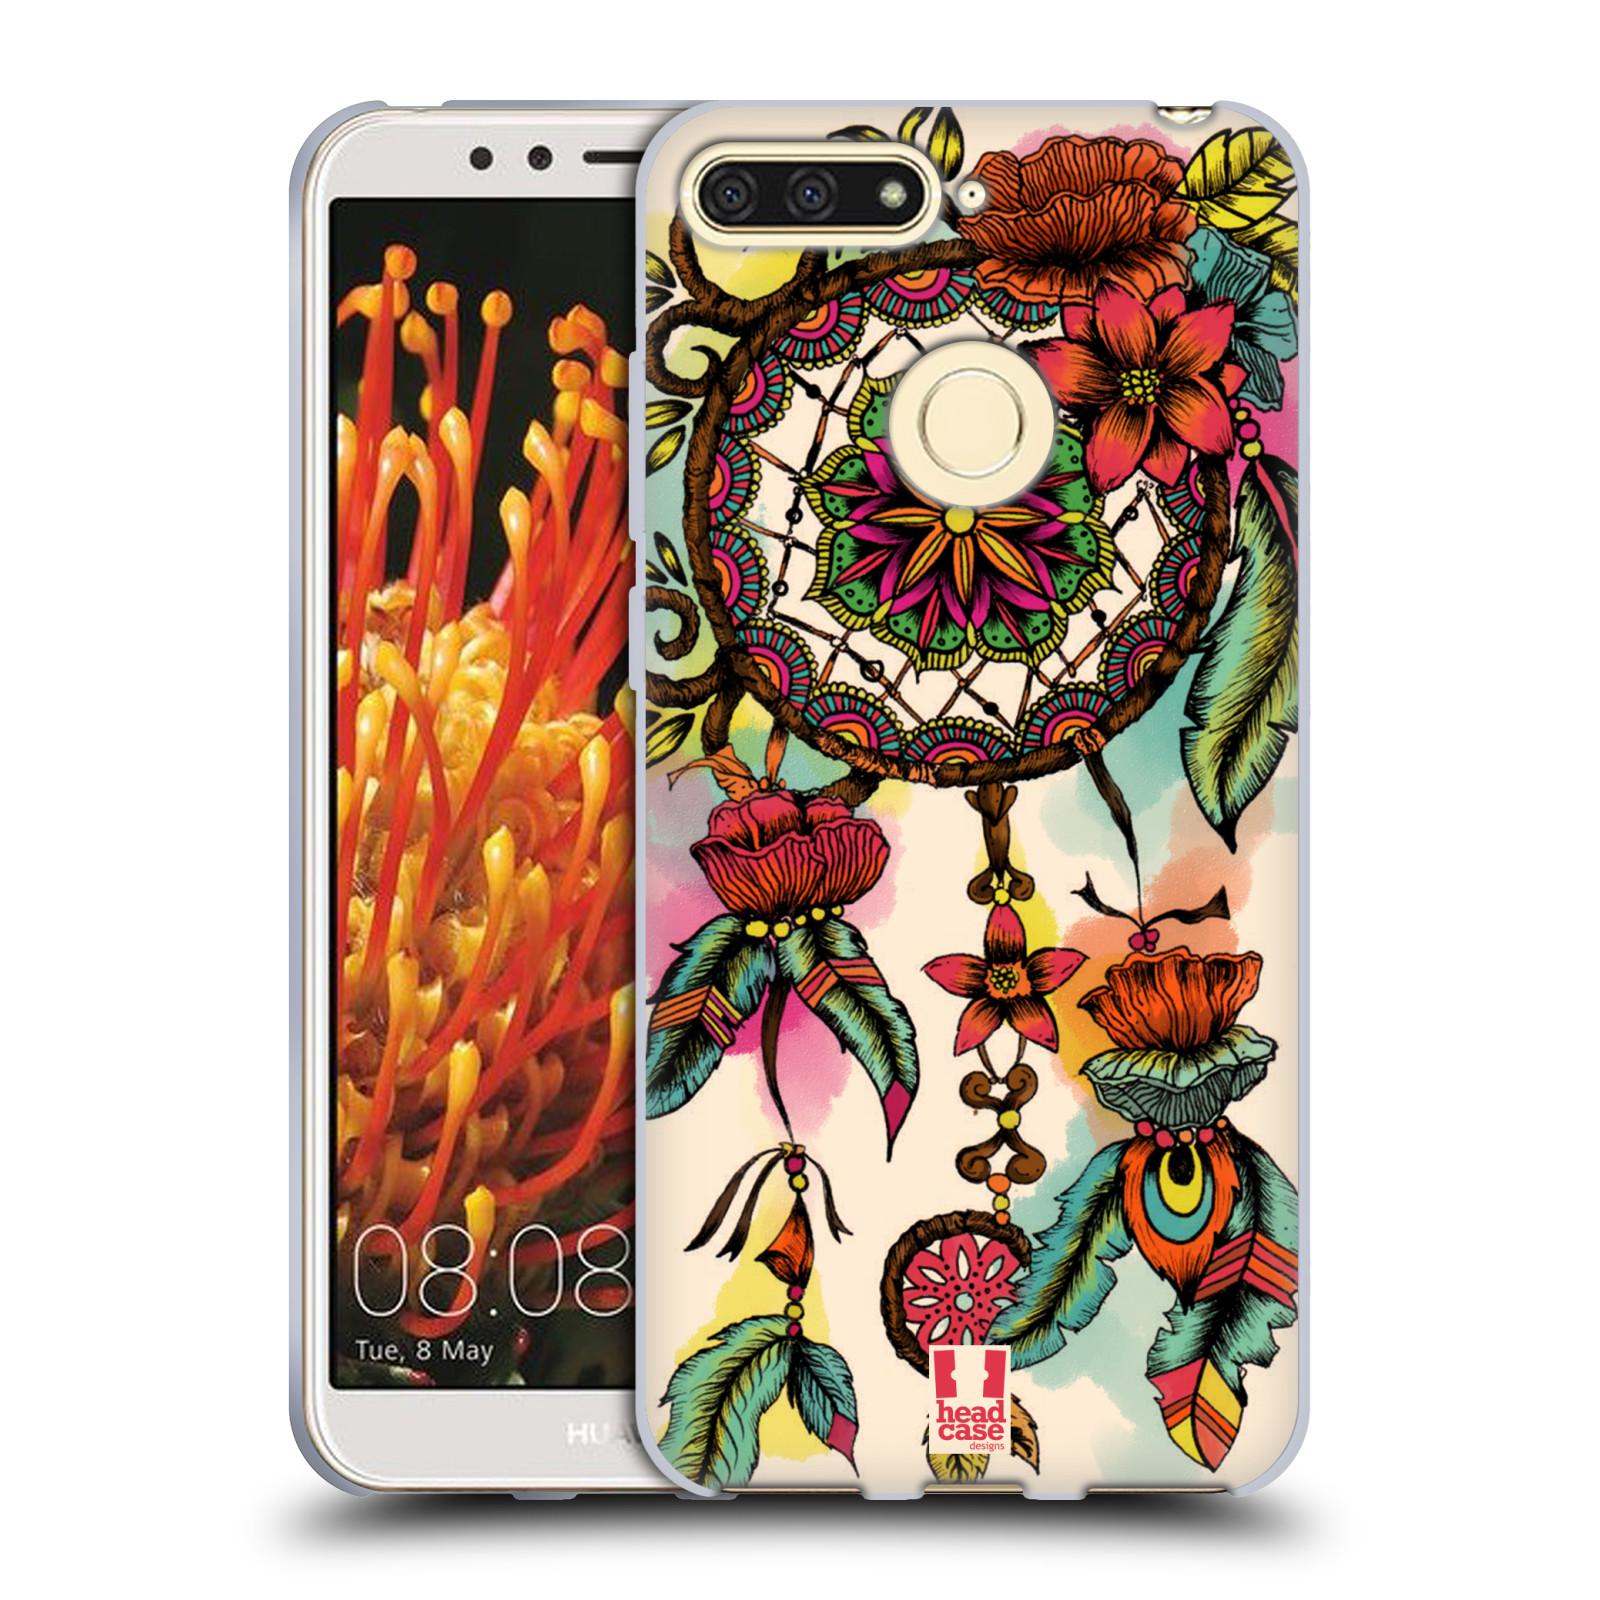 HEAD CASE silikonový obal na mobil Honor 7A vzor Květy lapač snů FLORID